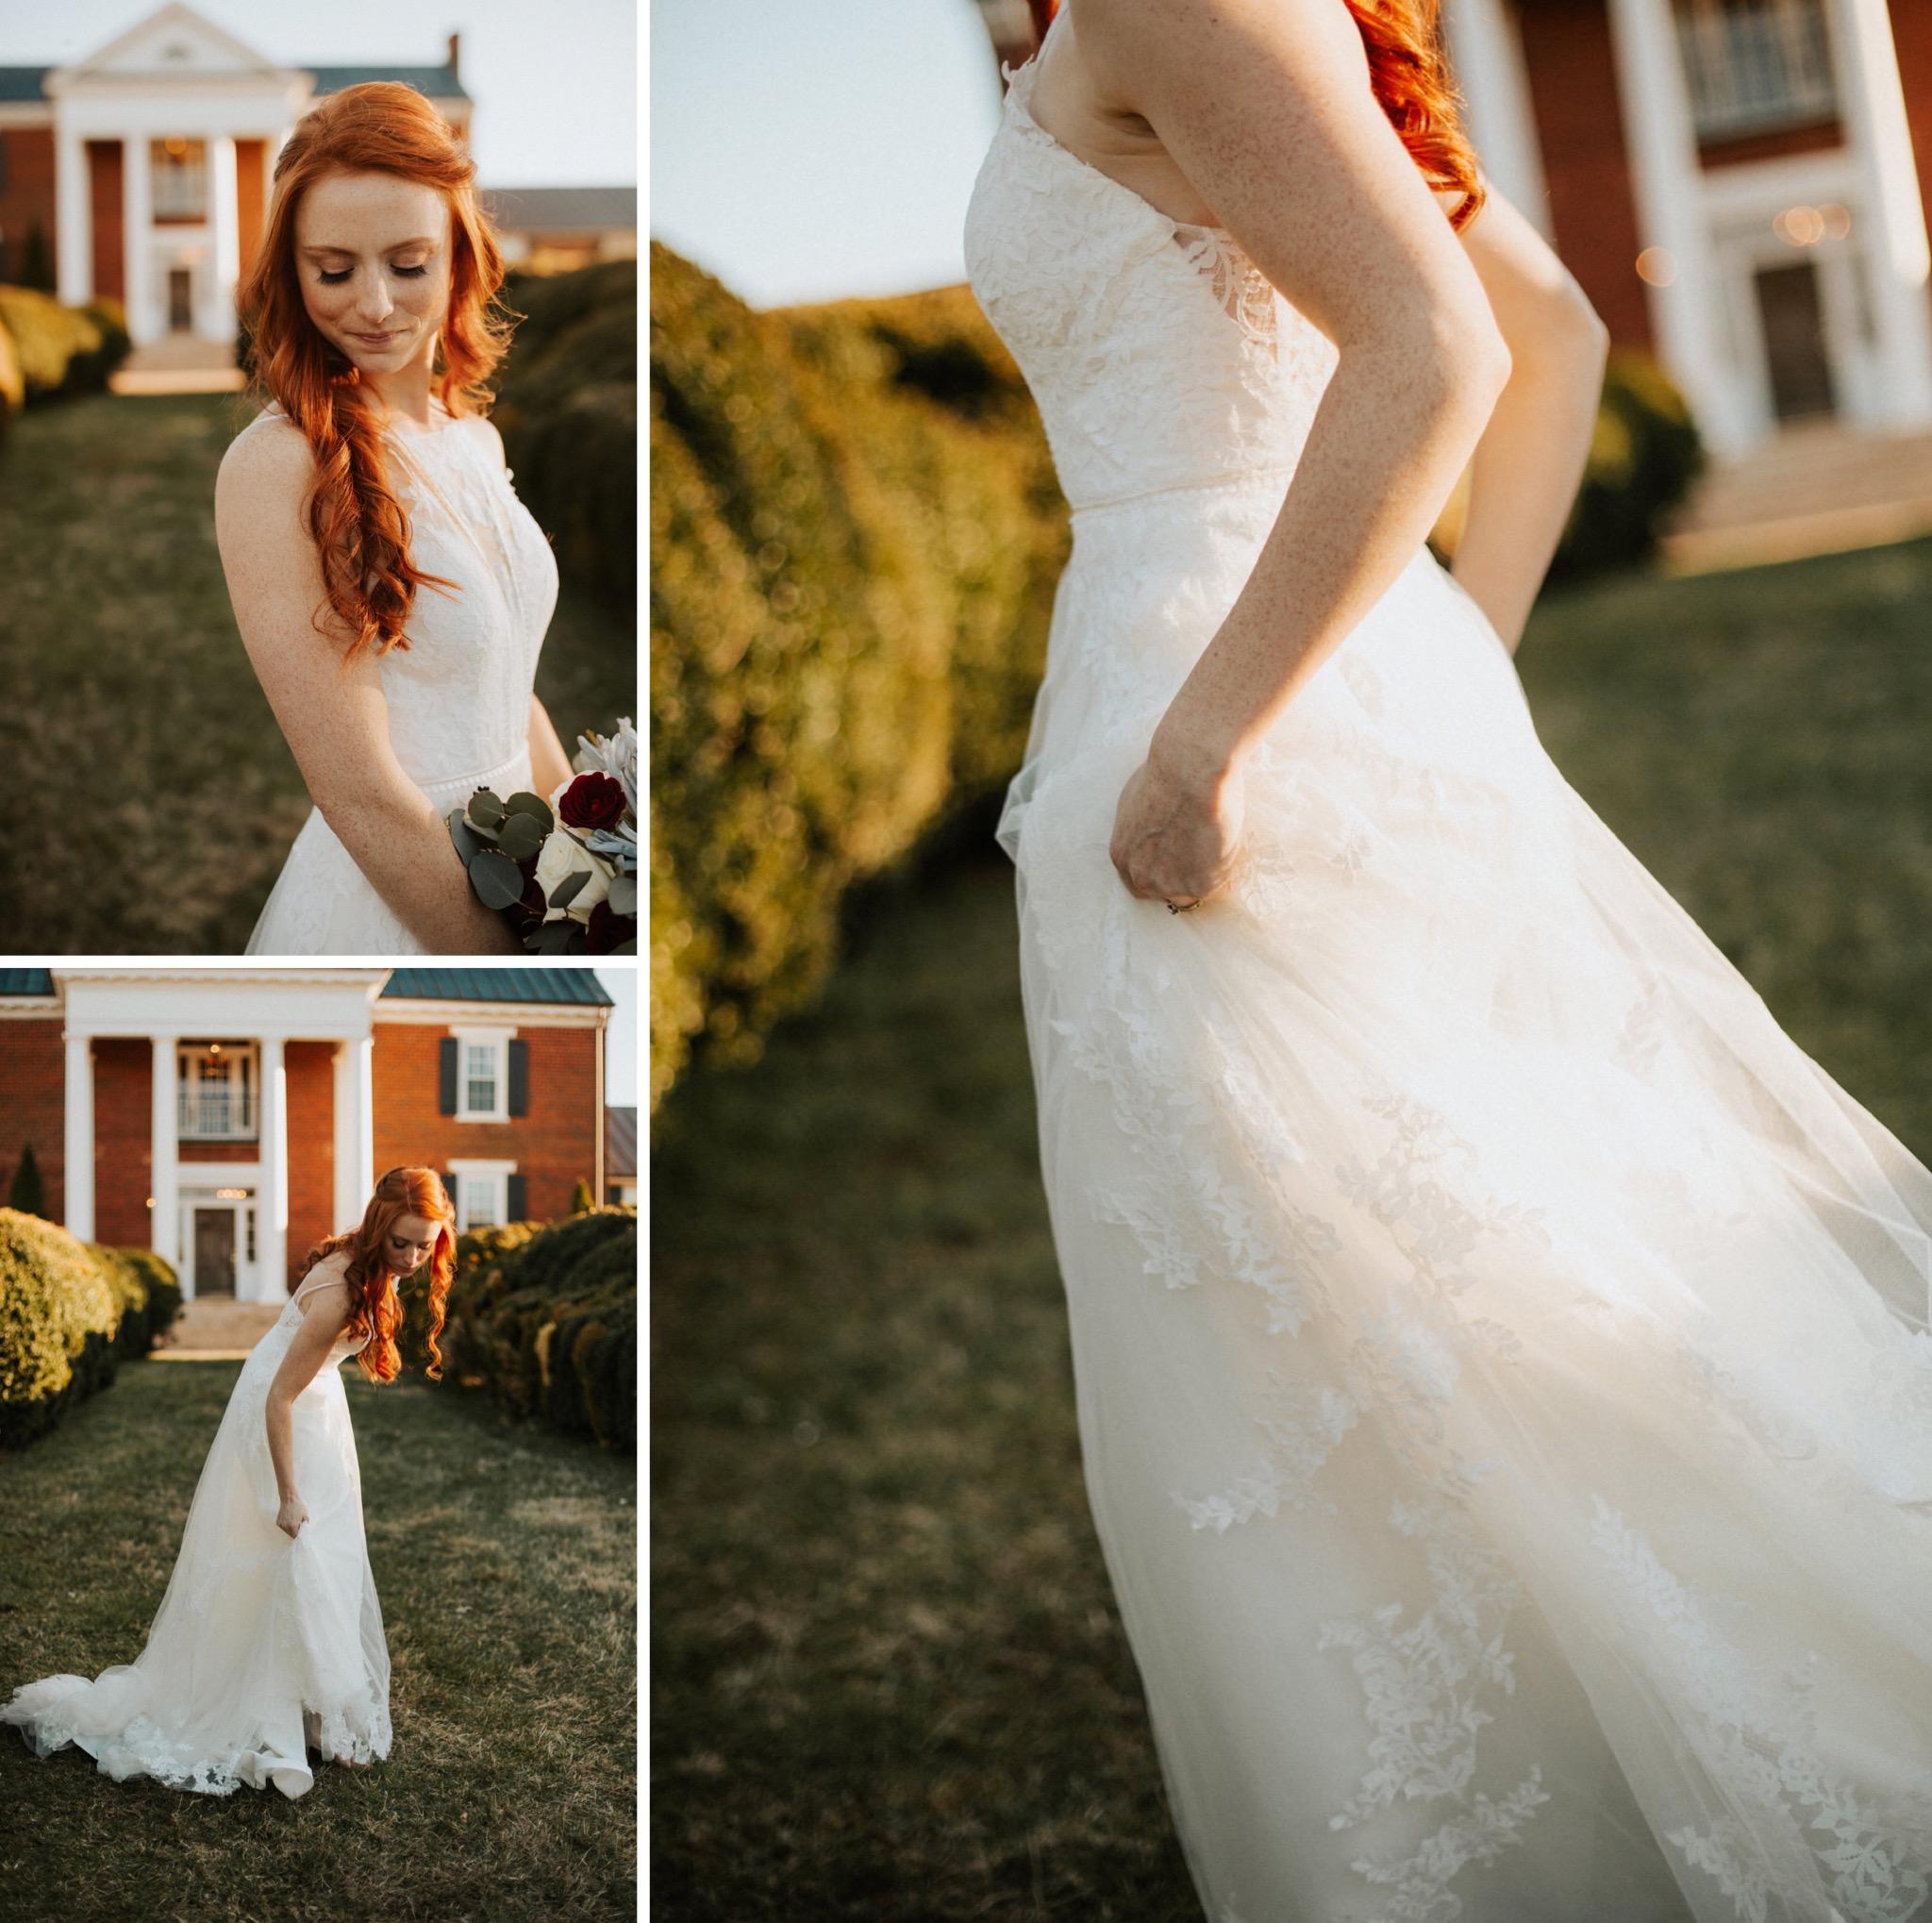 69_West Manor Estate Weddings - Pat Cori Photography-143_West Manor Estate Weddings - Pat Cori Photography-155_West Manor Estate Weddings - Pat Cori Photography-142_bride_VirginiaWeddingPhotographer_WestManorEstate_Portraits_Wedding.jpg